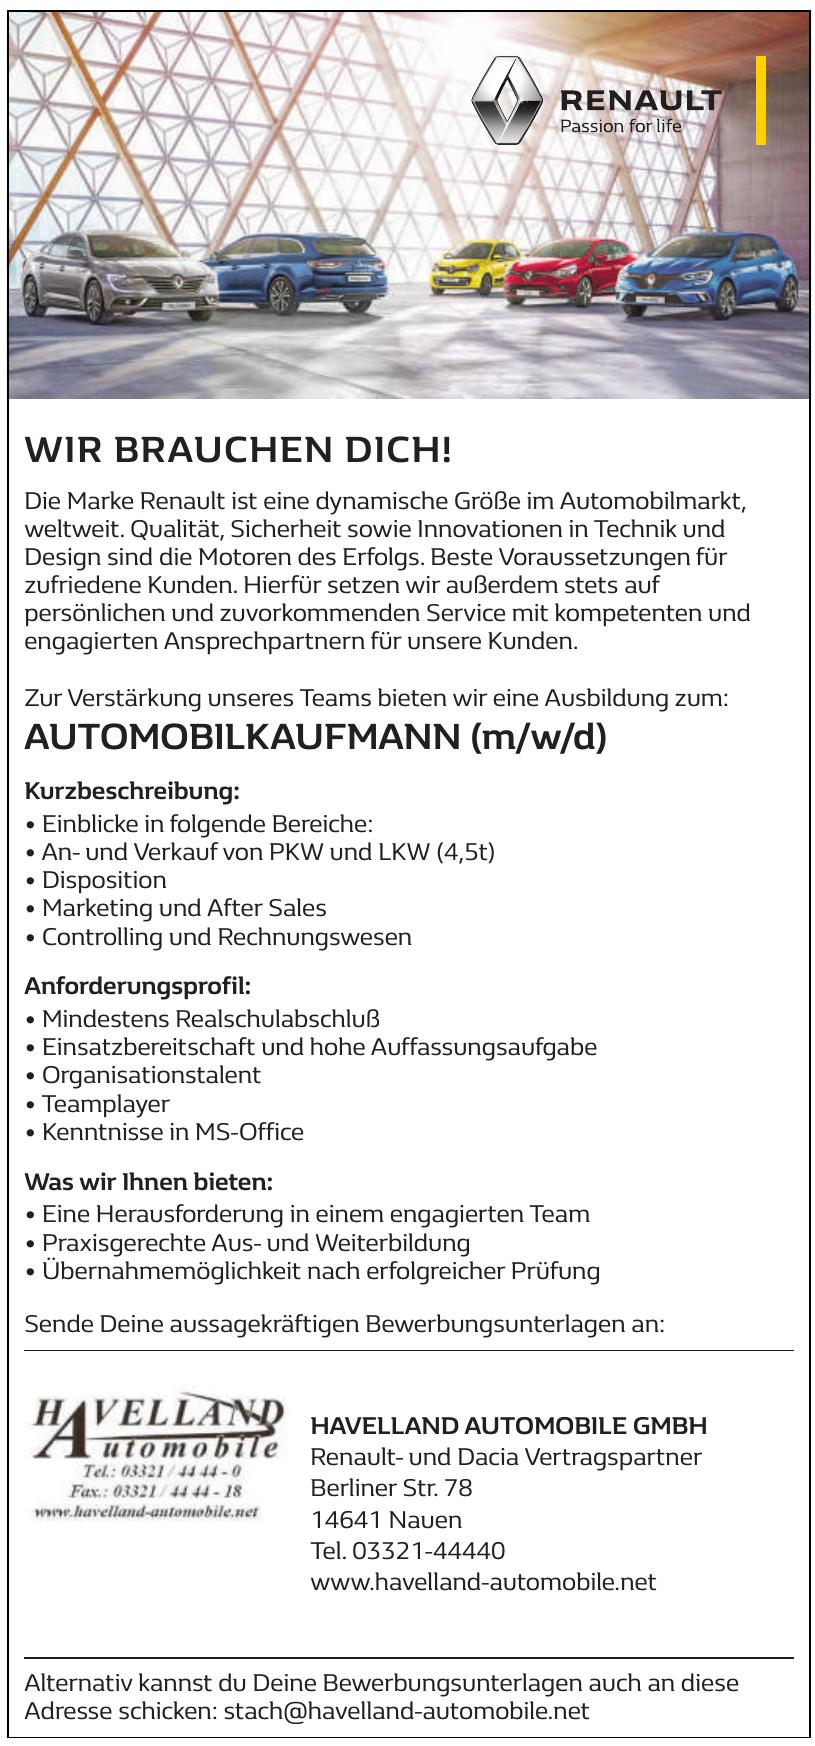 Havelland Automobile GmbH